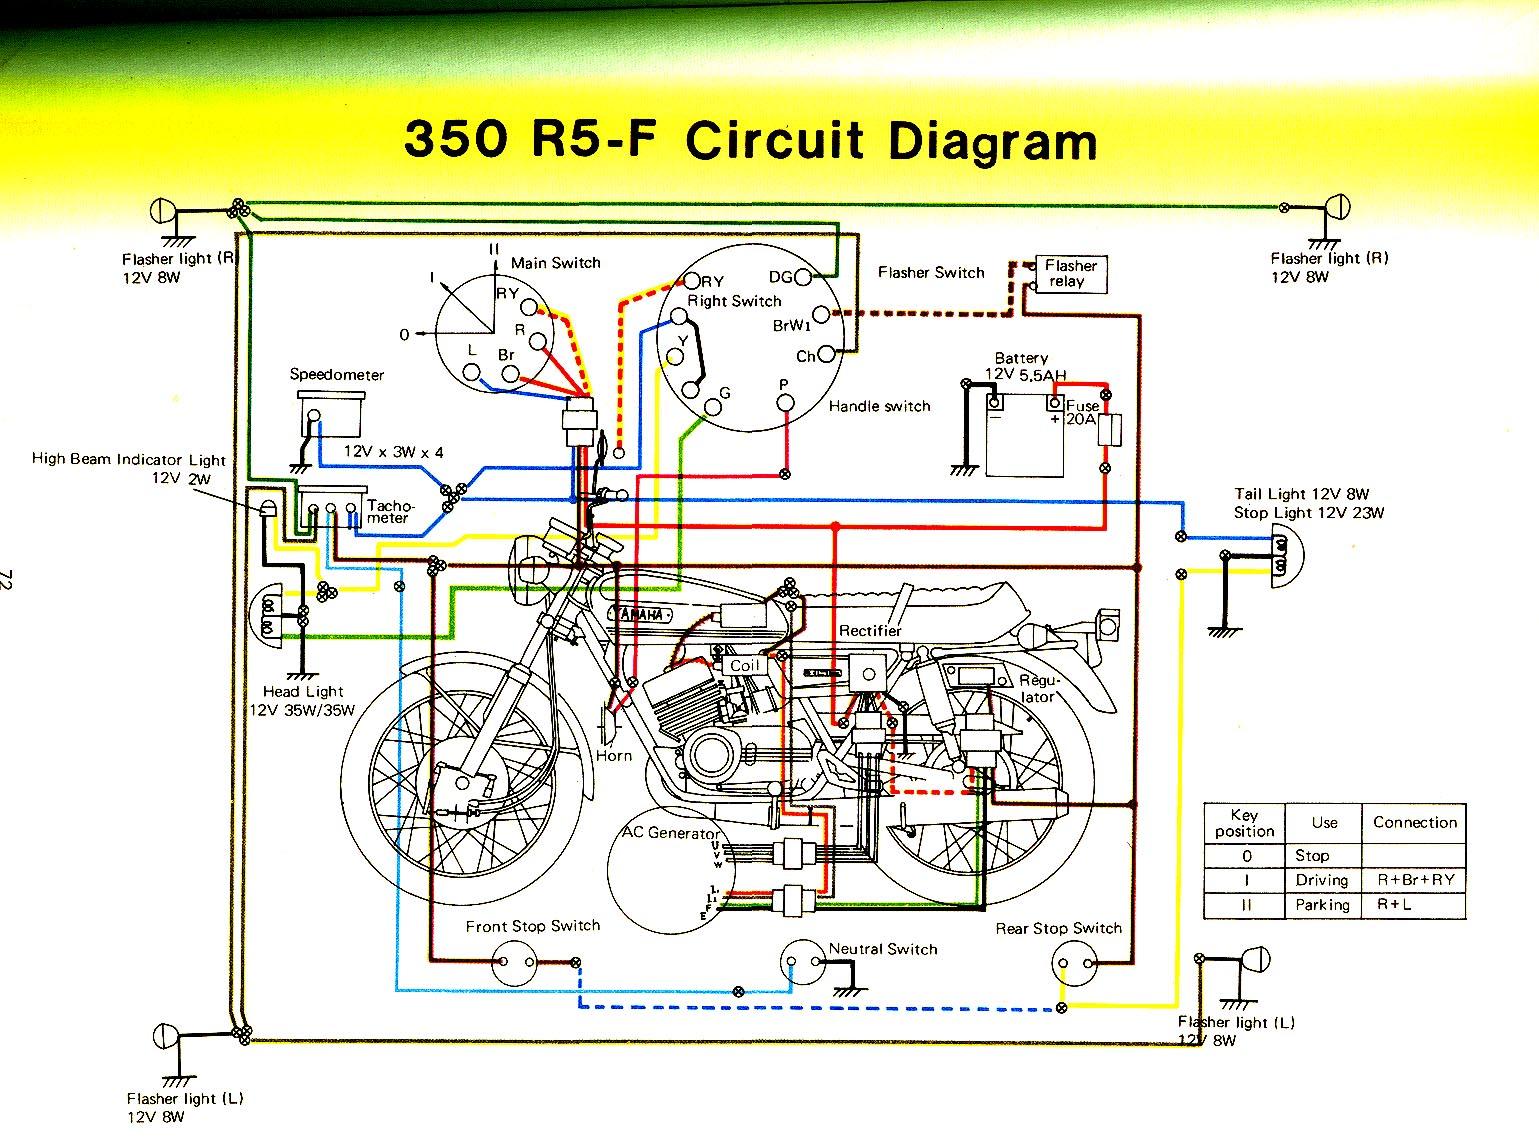 hight resolution of yamaha r5 wiring diagram wiring diagram blog yamaha r5 wiring diagram